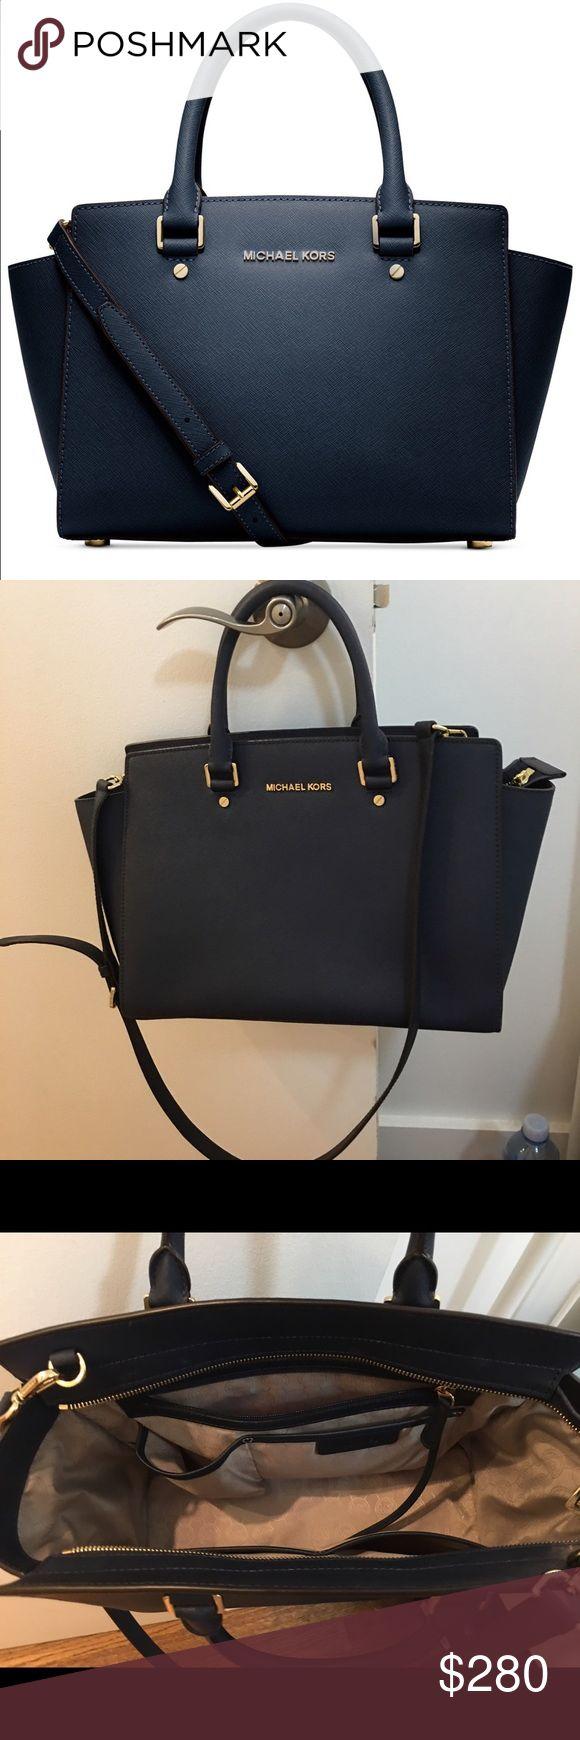 Michael Kors Selma Large Navy 99.9%new! with dust bag! No sign of wear. Fit 13' MacBook air. Best work bag!original price$358+tax Michael Kors Bags Satchels